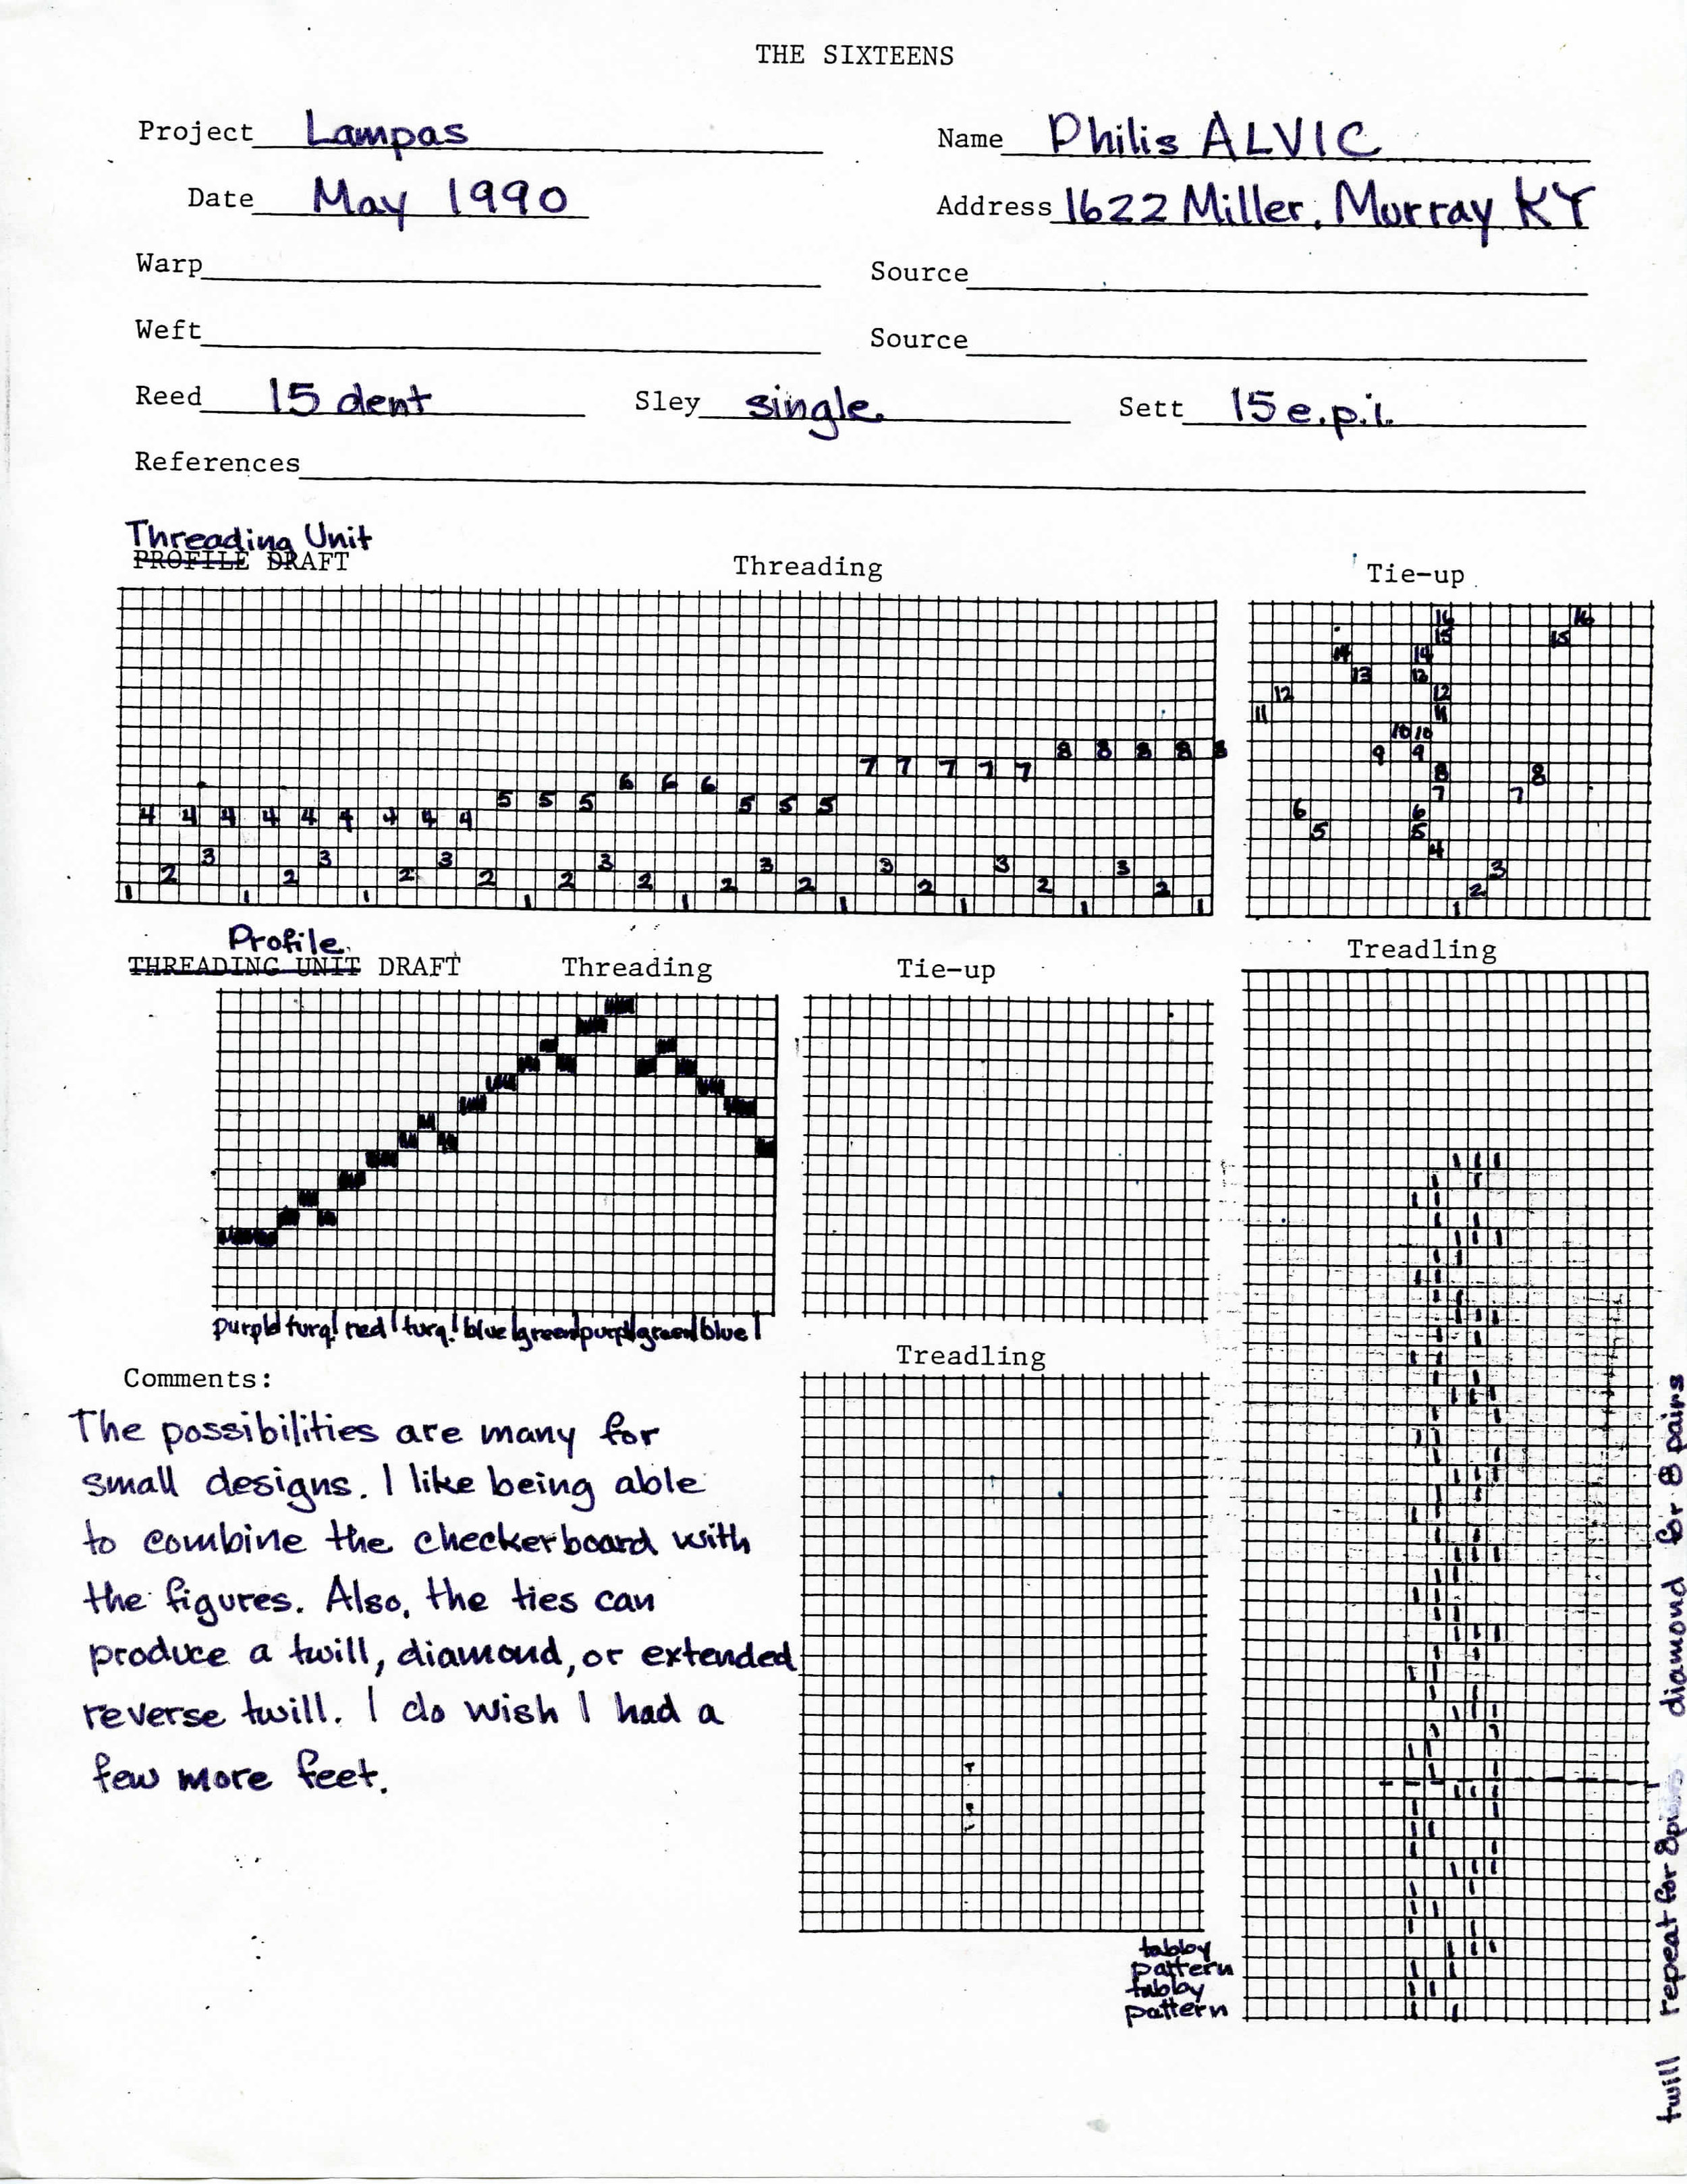 1990_Page_1_Image_0001.jpg